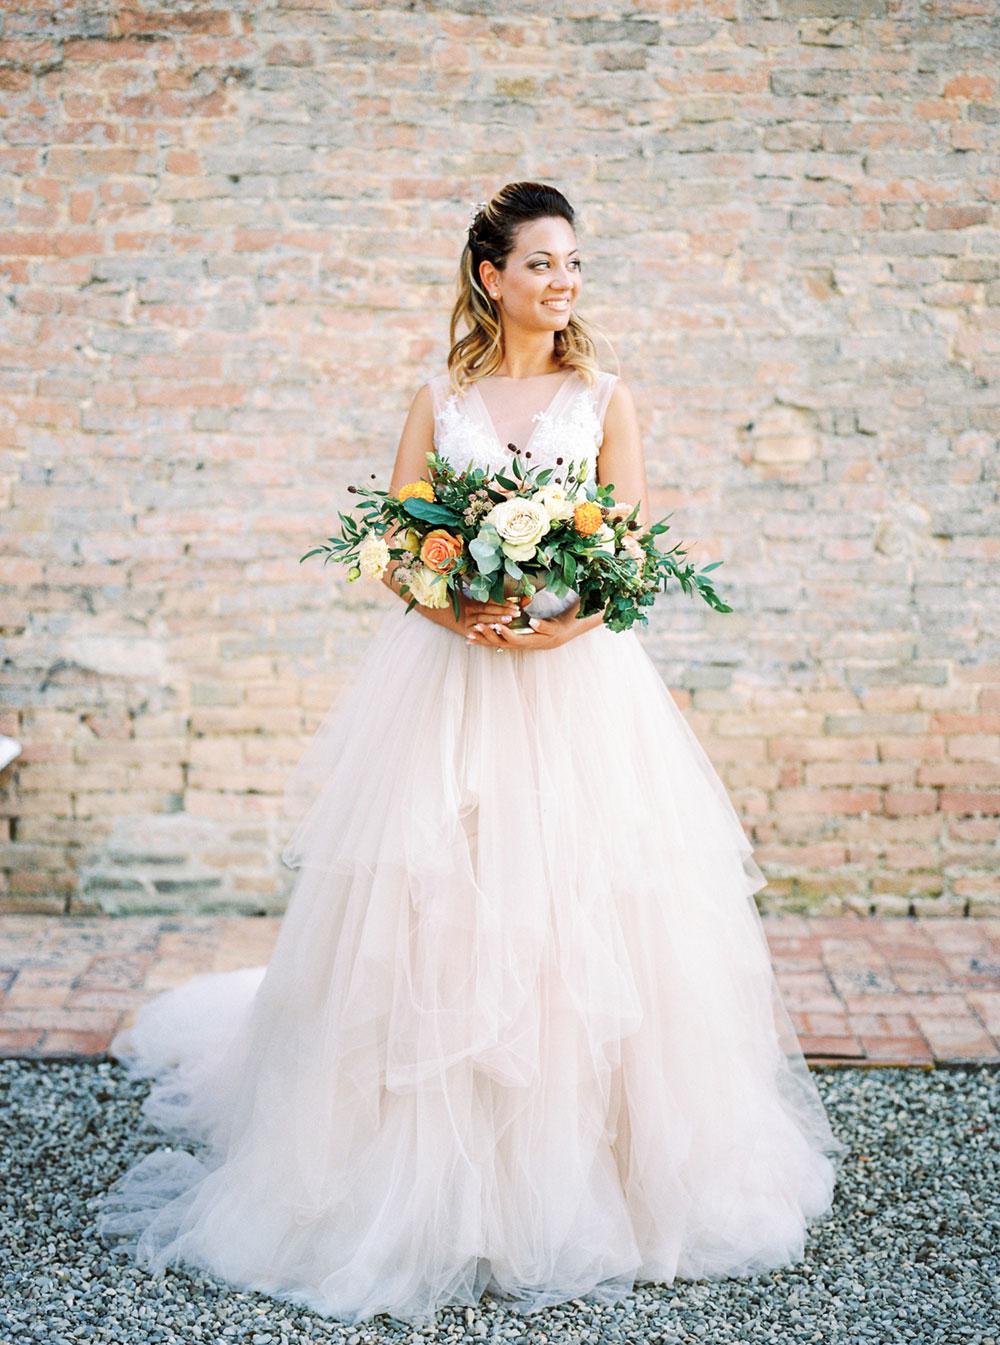 Linari-Tuscany-Elopement-Courtney-Michaela-102